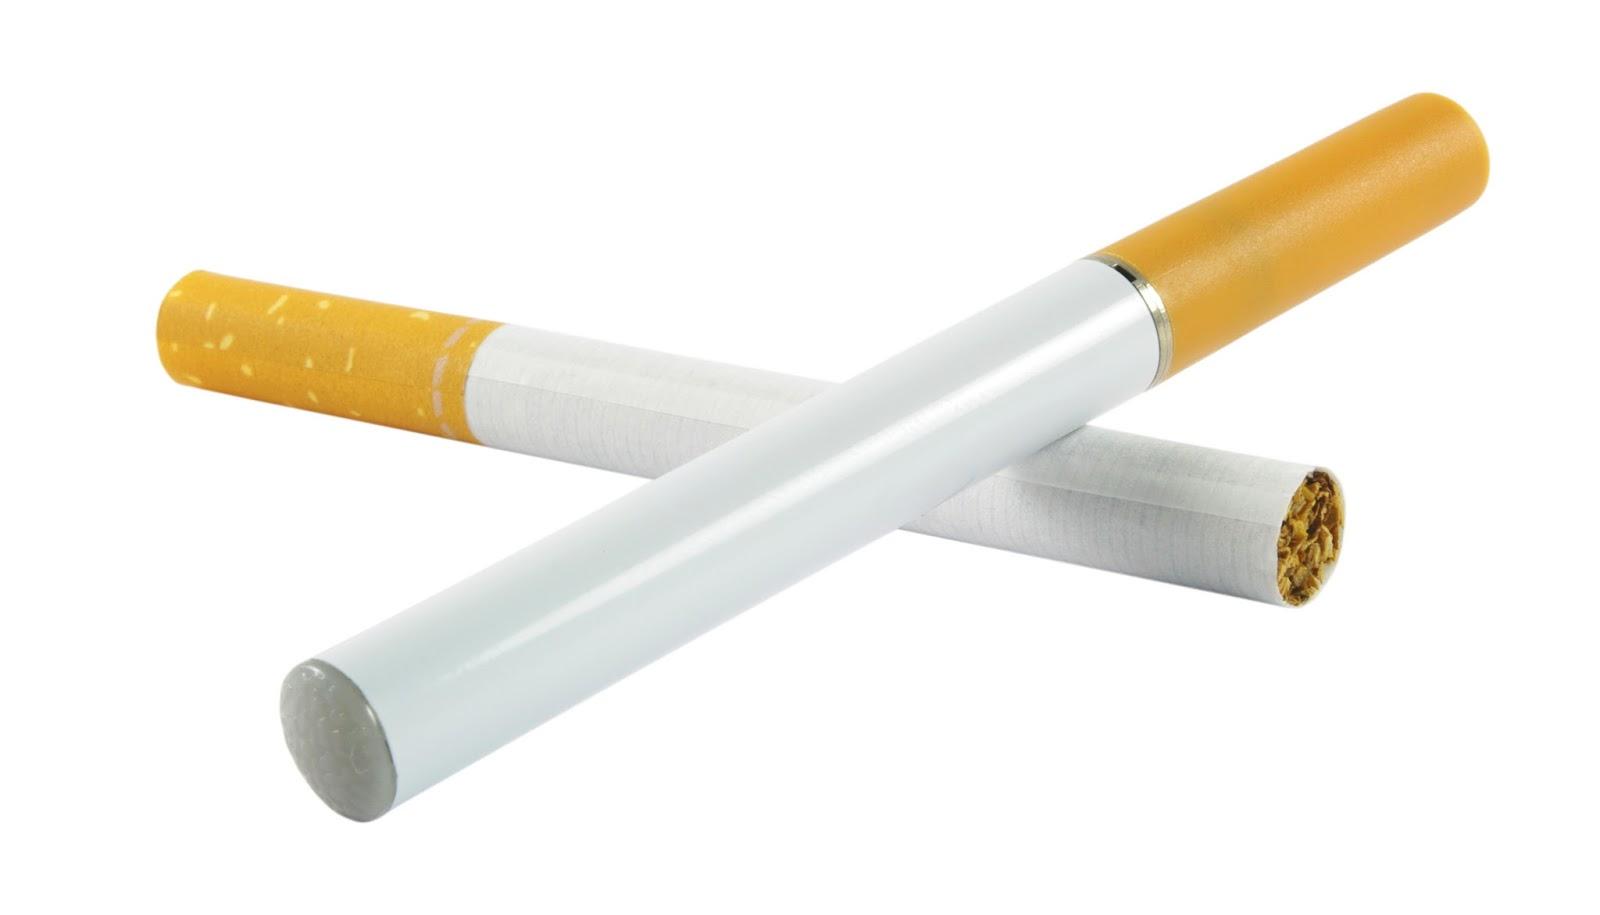 Vaping vs. Smoking: The Facts